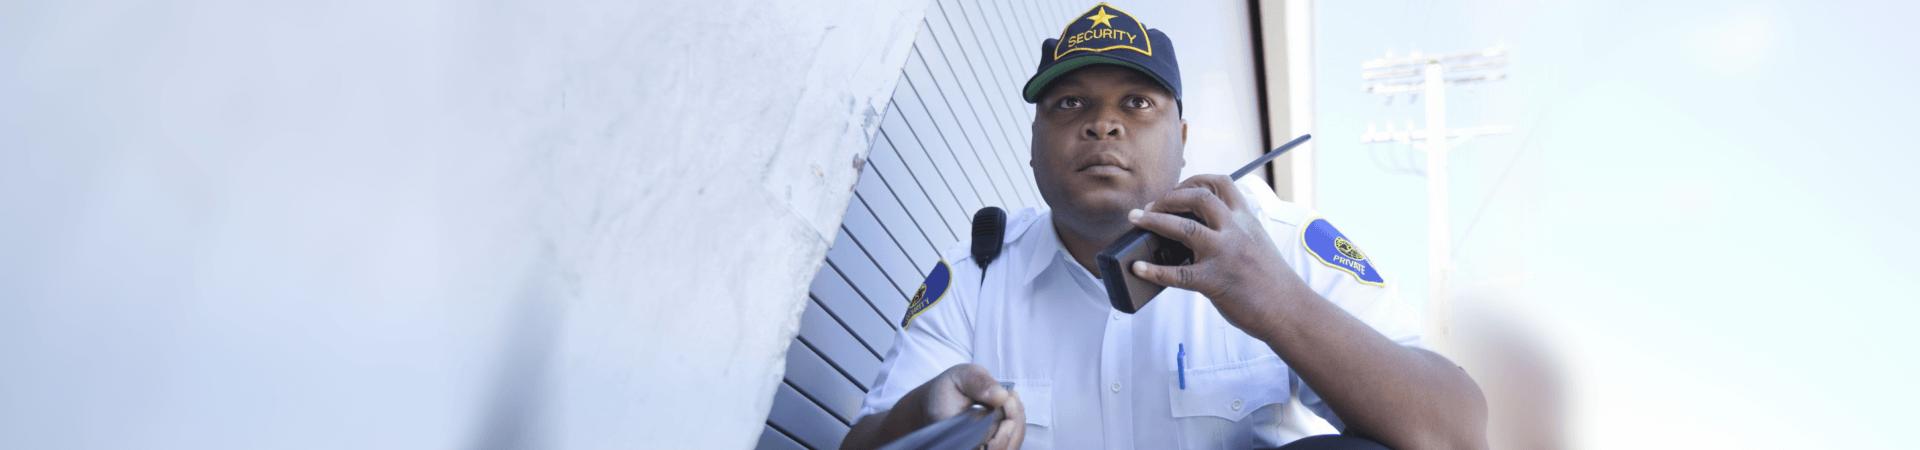 police police officer